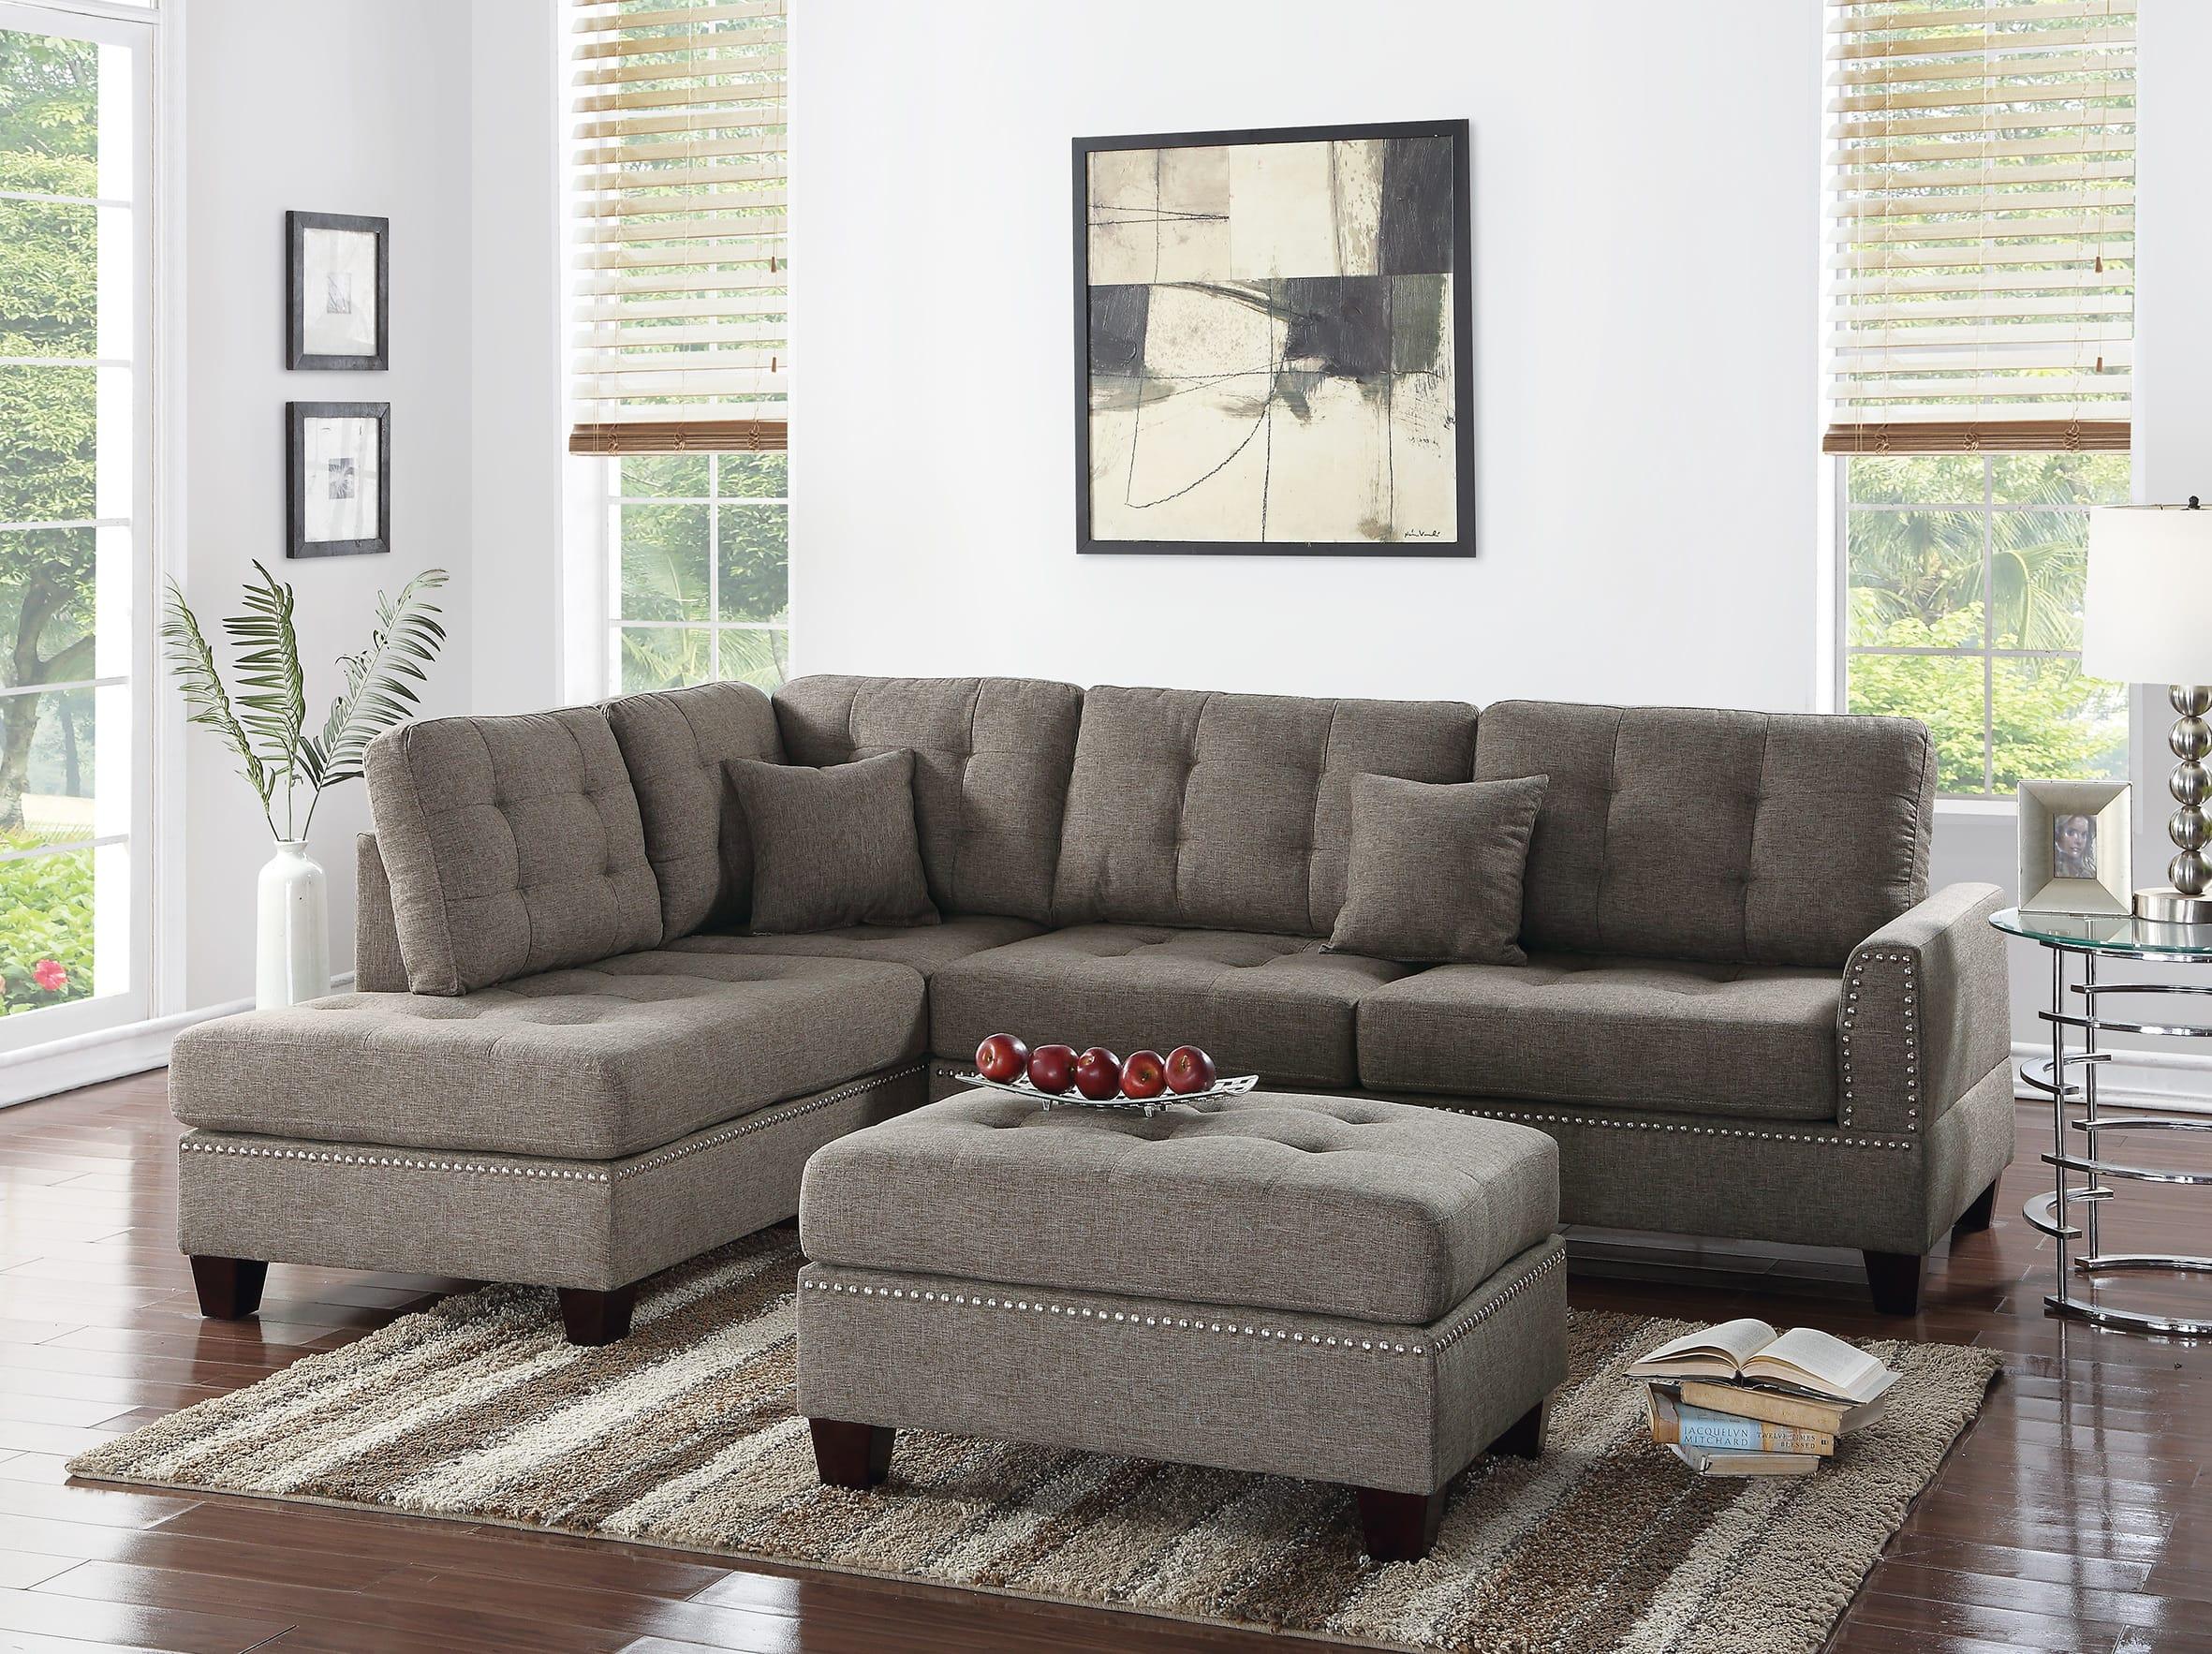 F6504 Coffee 3 Pcs Sectional Sofa Set By Poundex